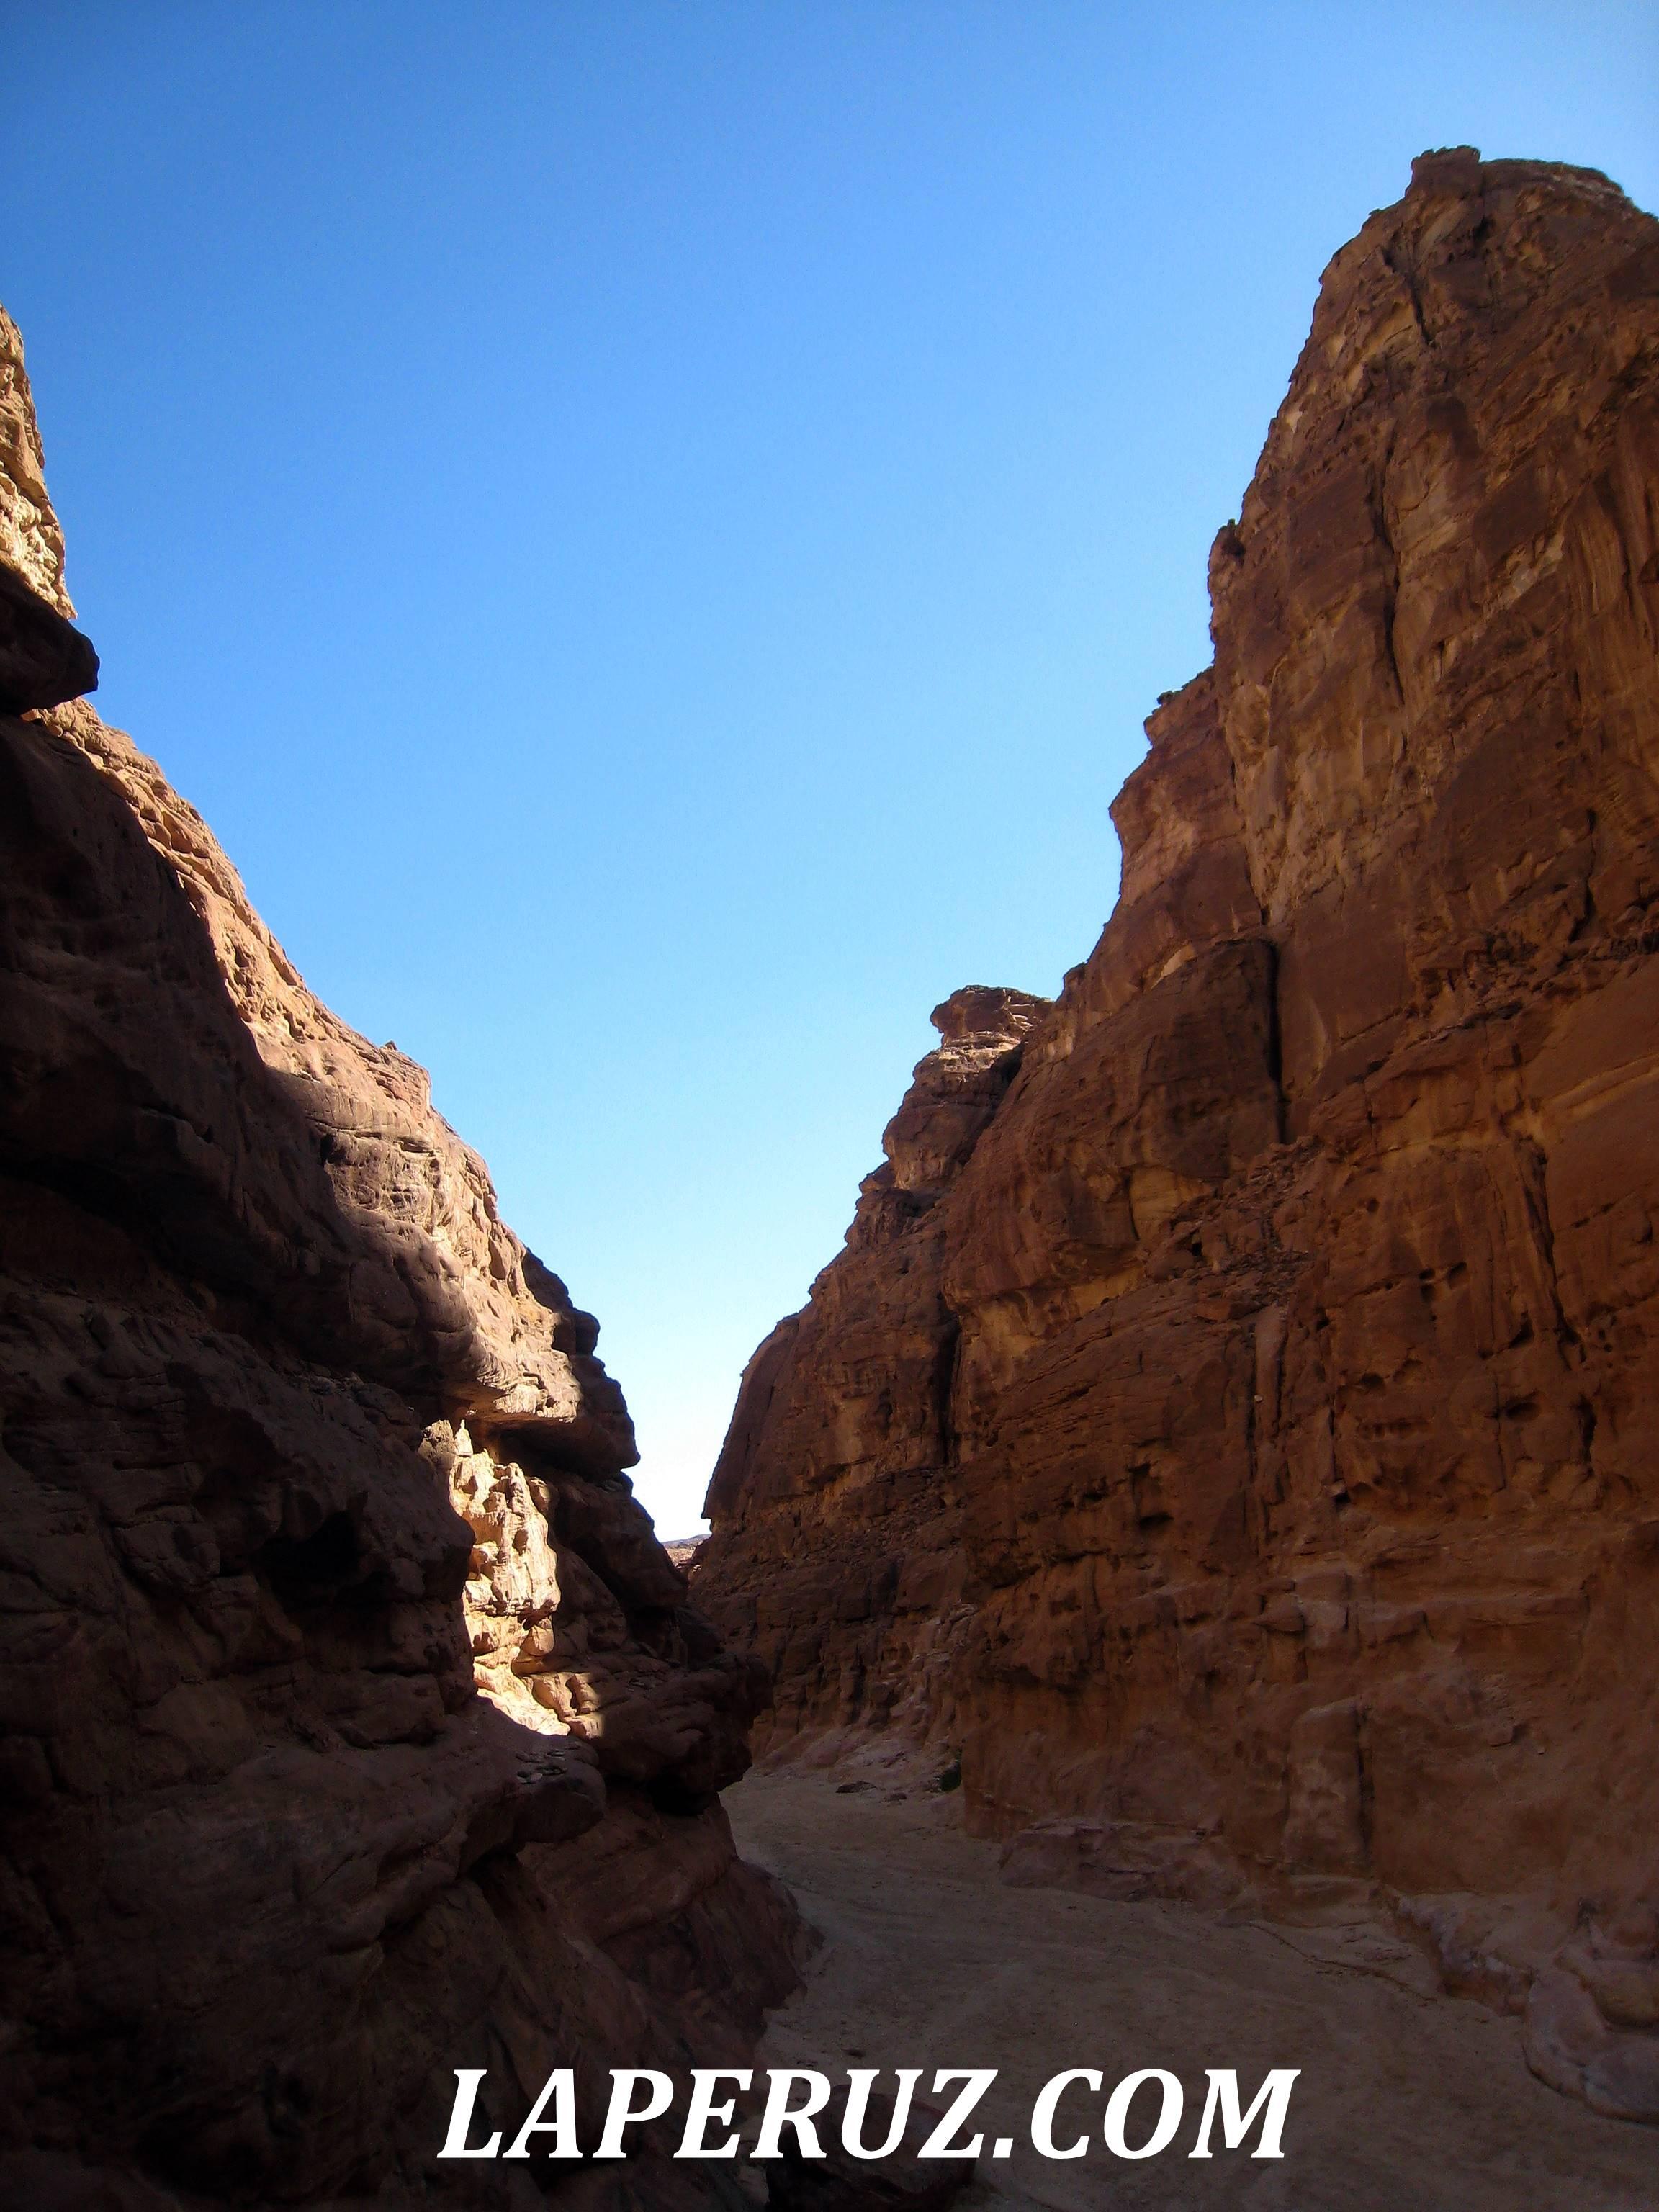 cvetnoi_kanyon_egypt_16